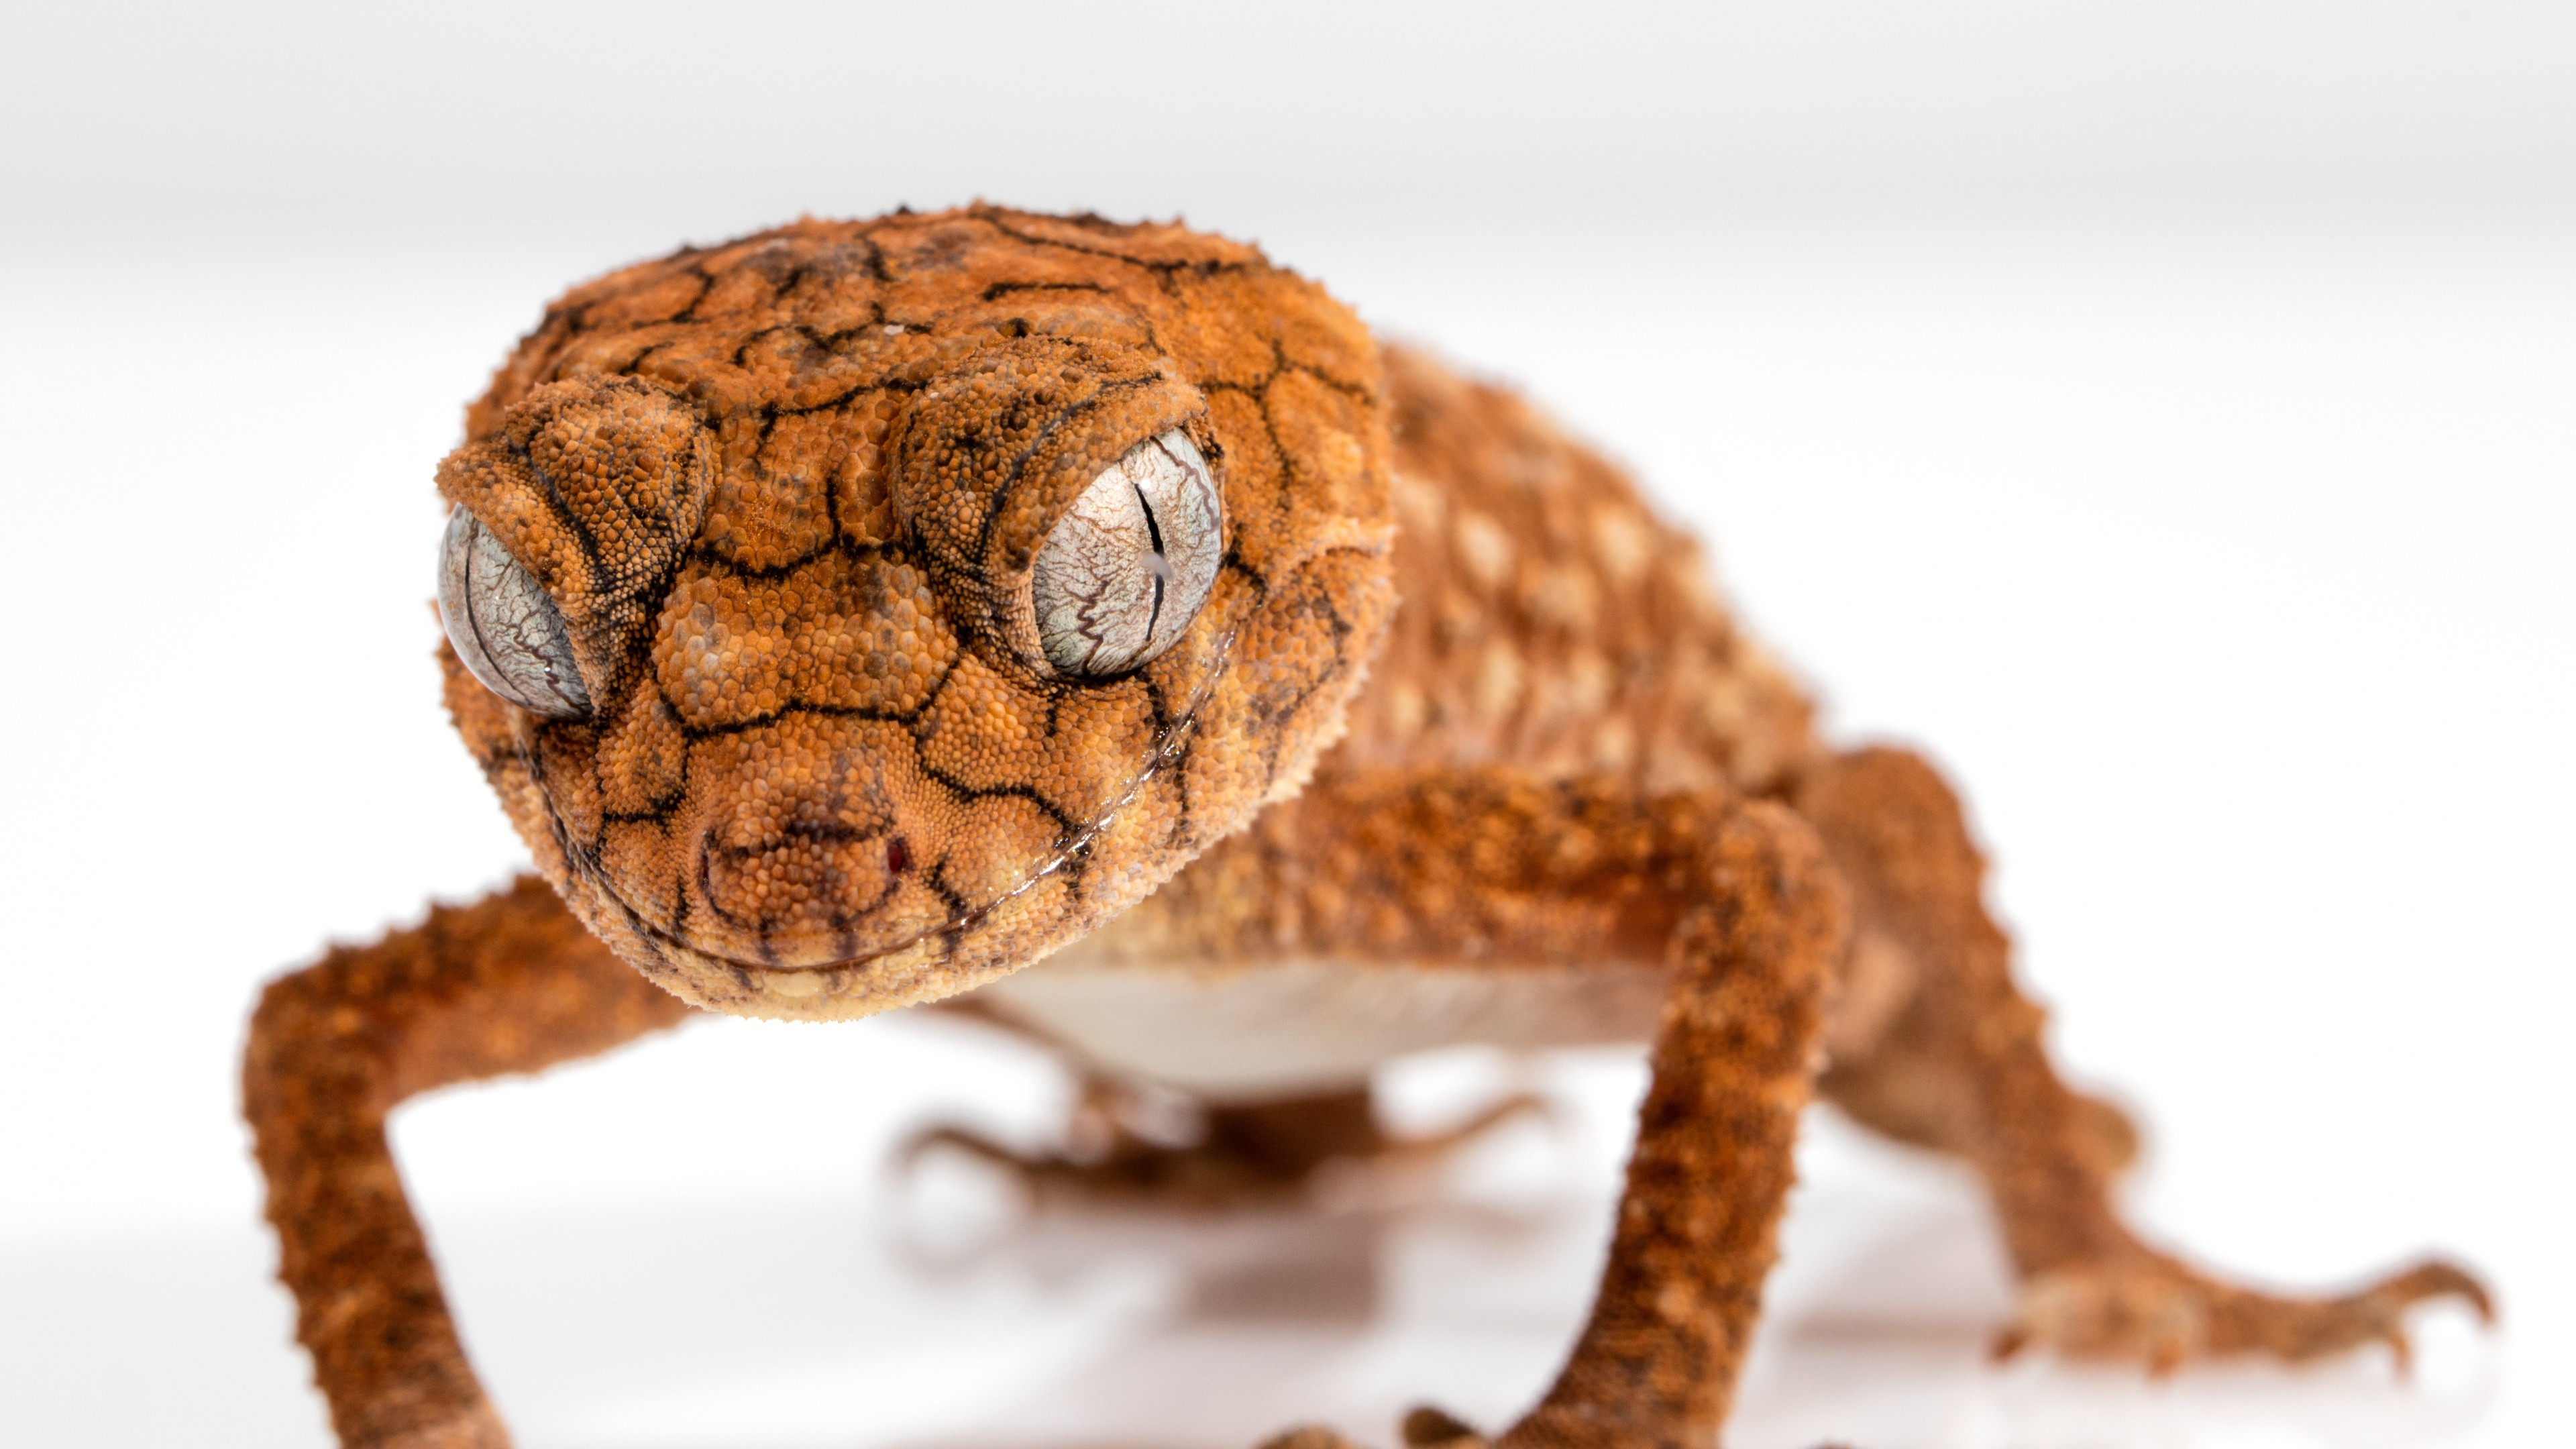 Wallpaper Gecko Caledonian Crested Gecko Reptile Lizard